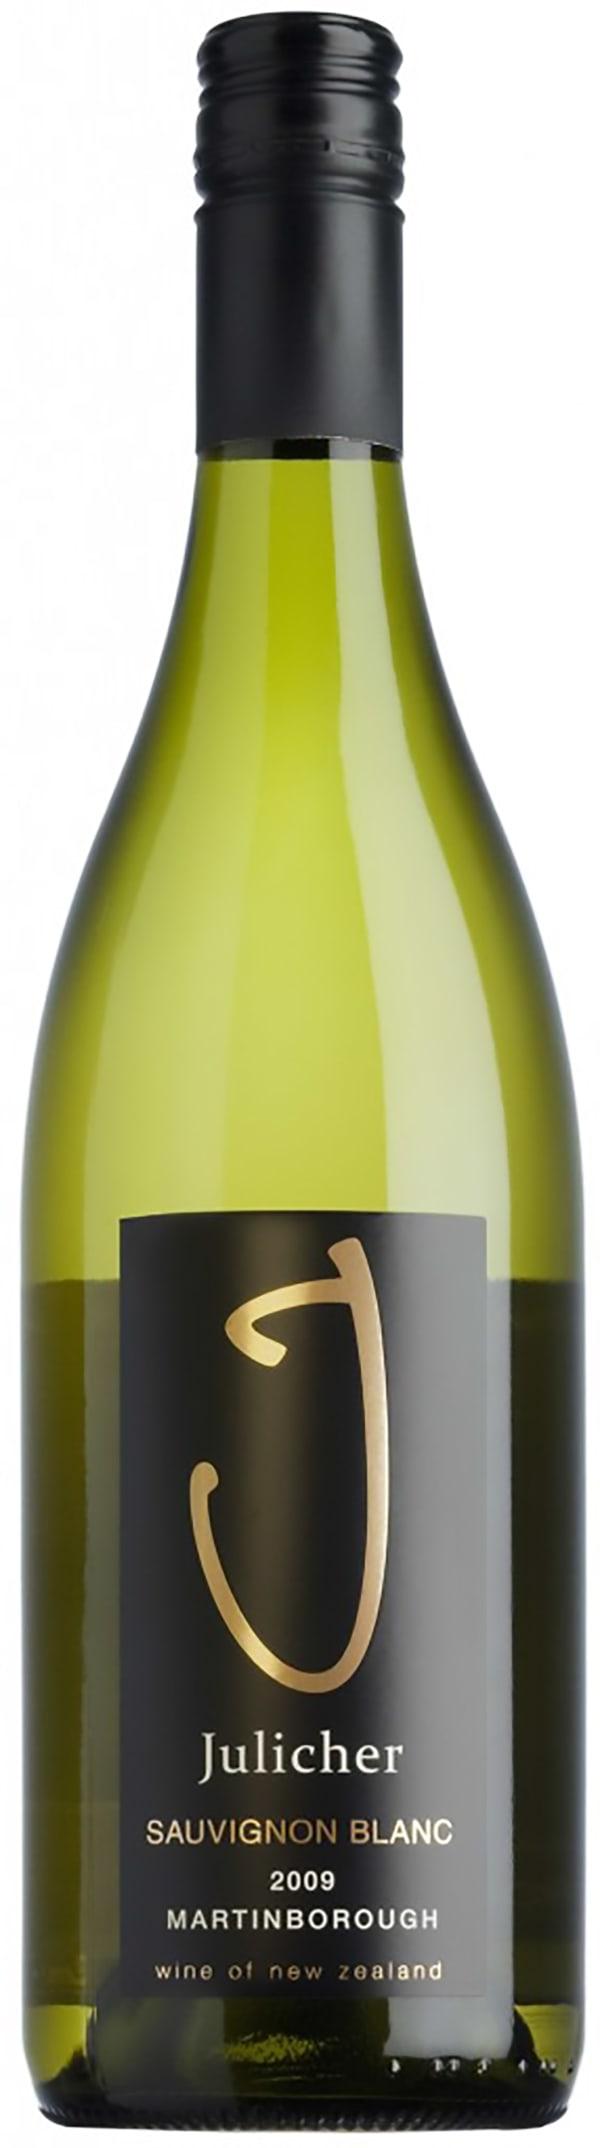 Julicher Sauvignon Blanc 2015